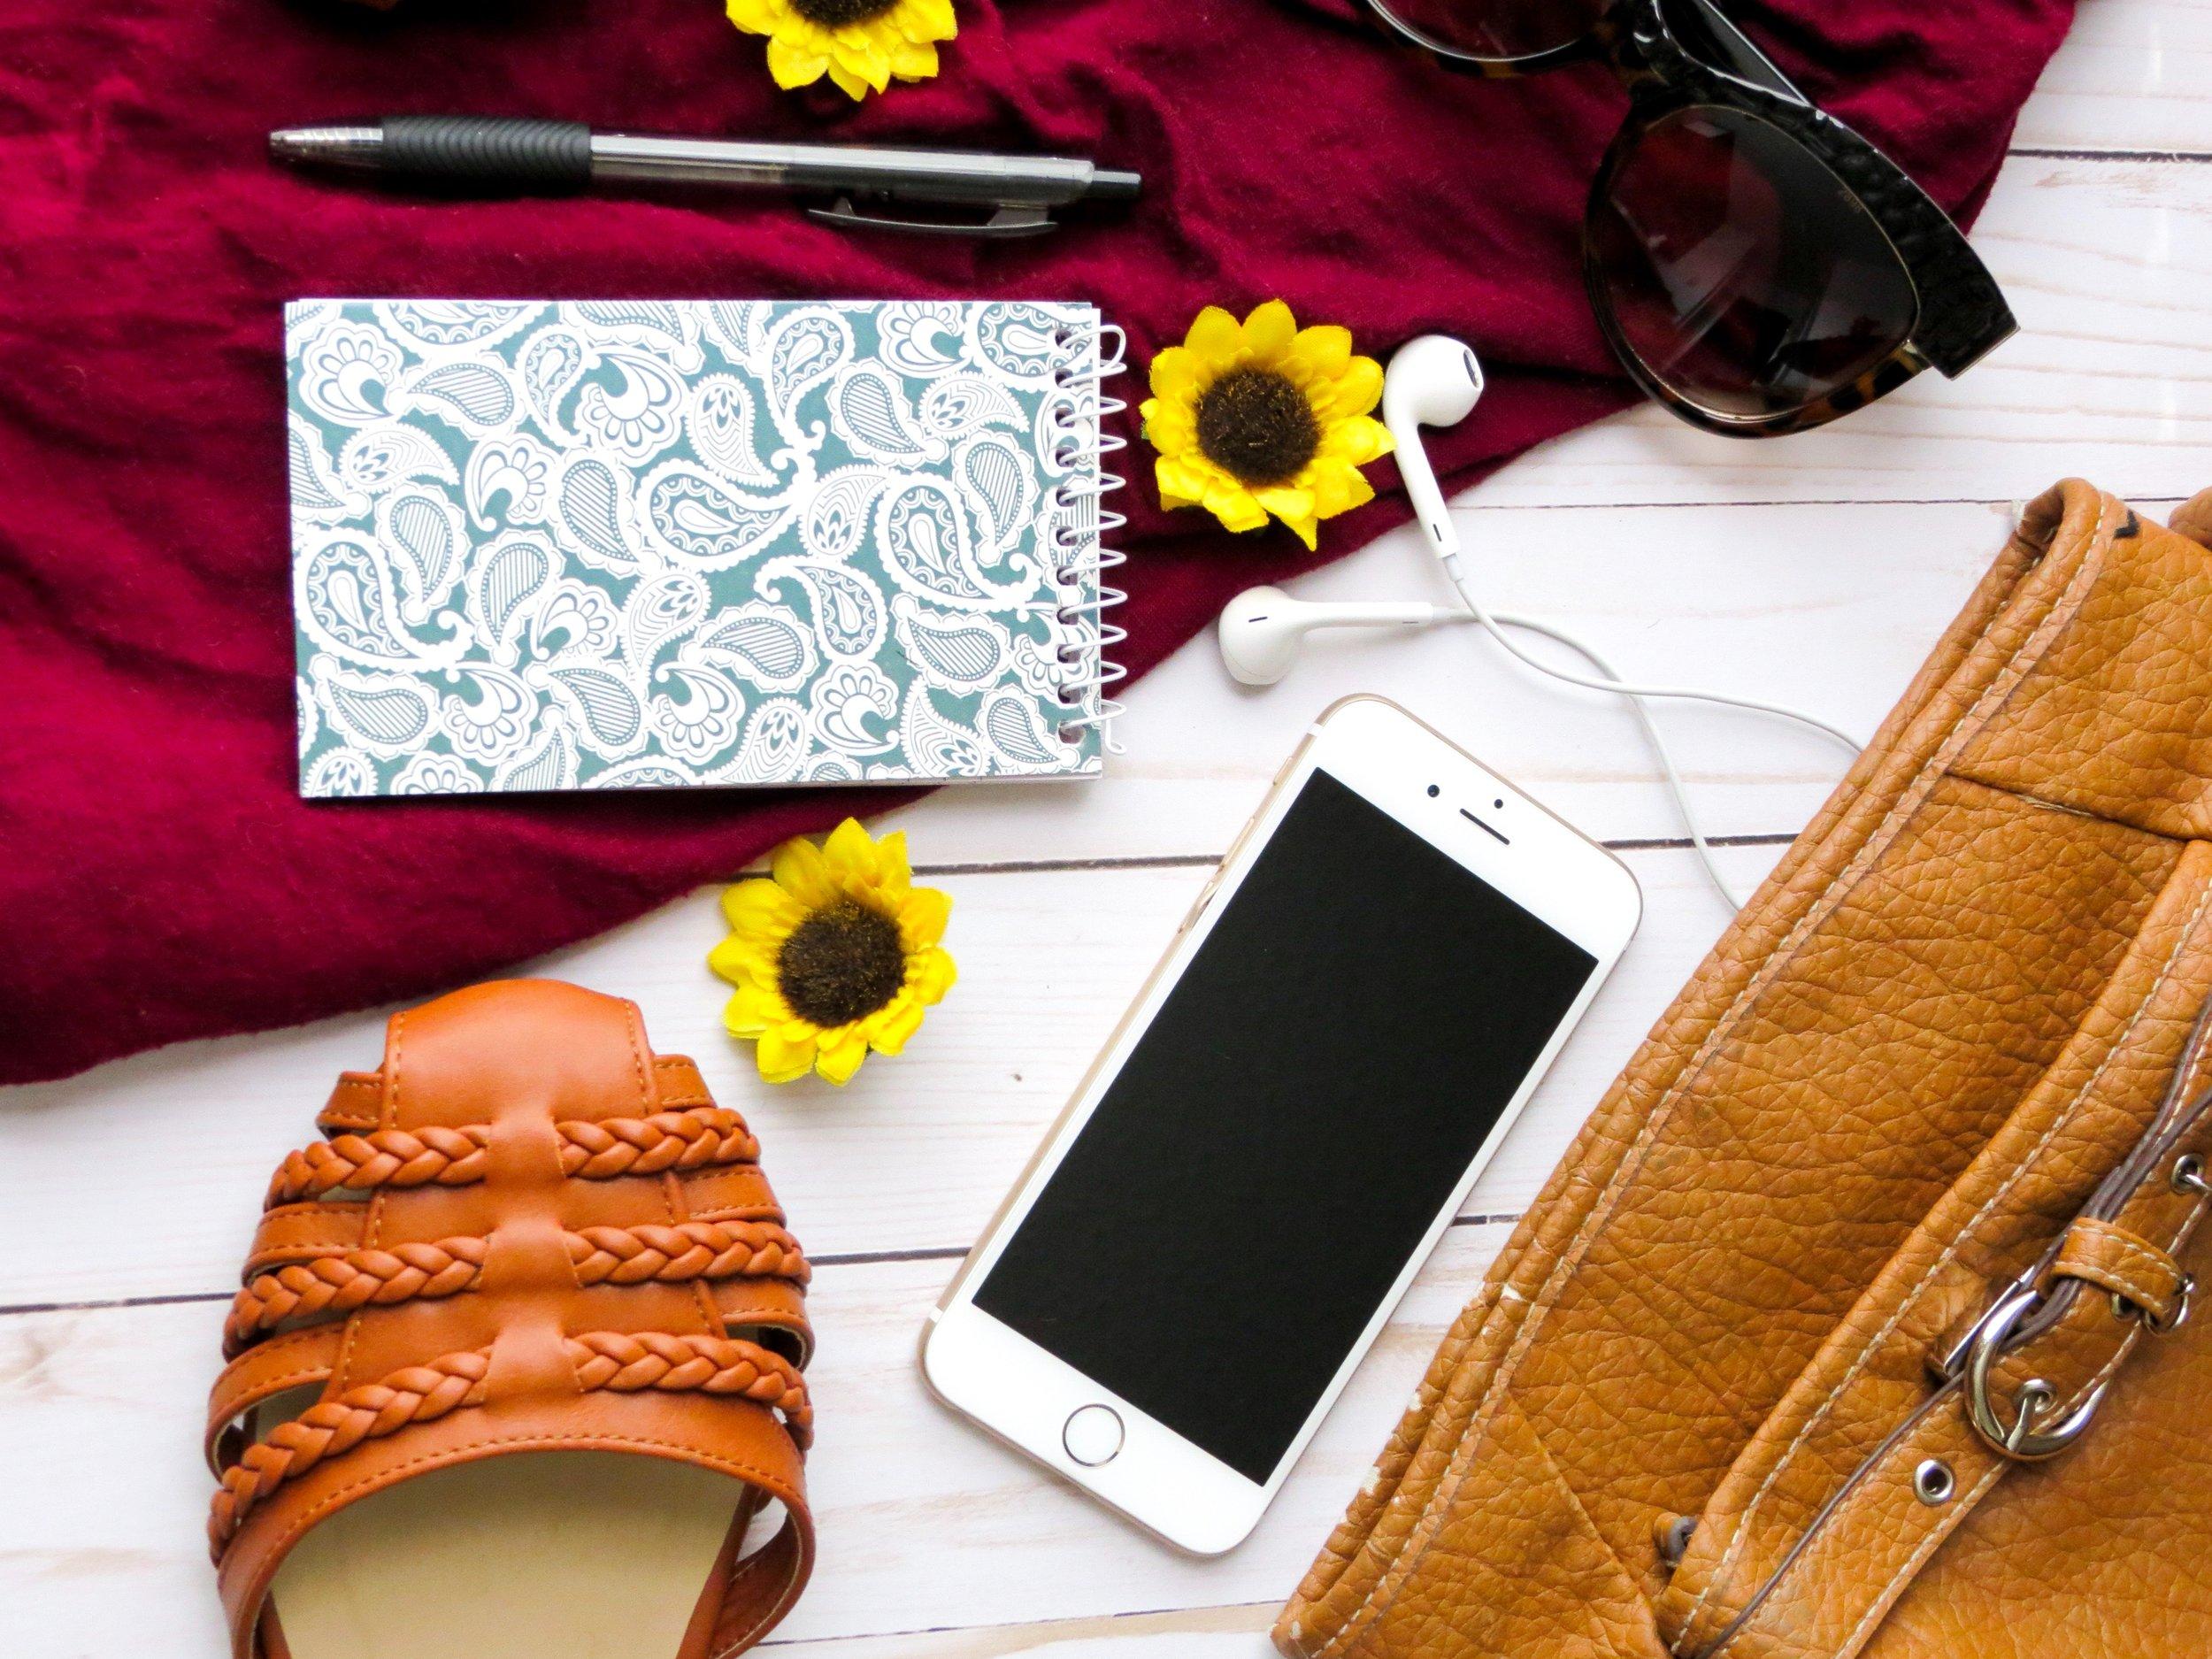 bag-brown-eyewear-426862.jpg